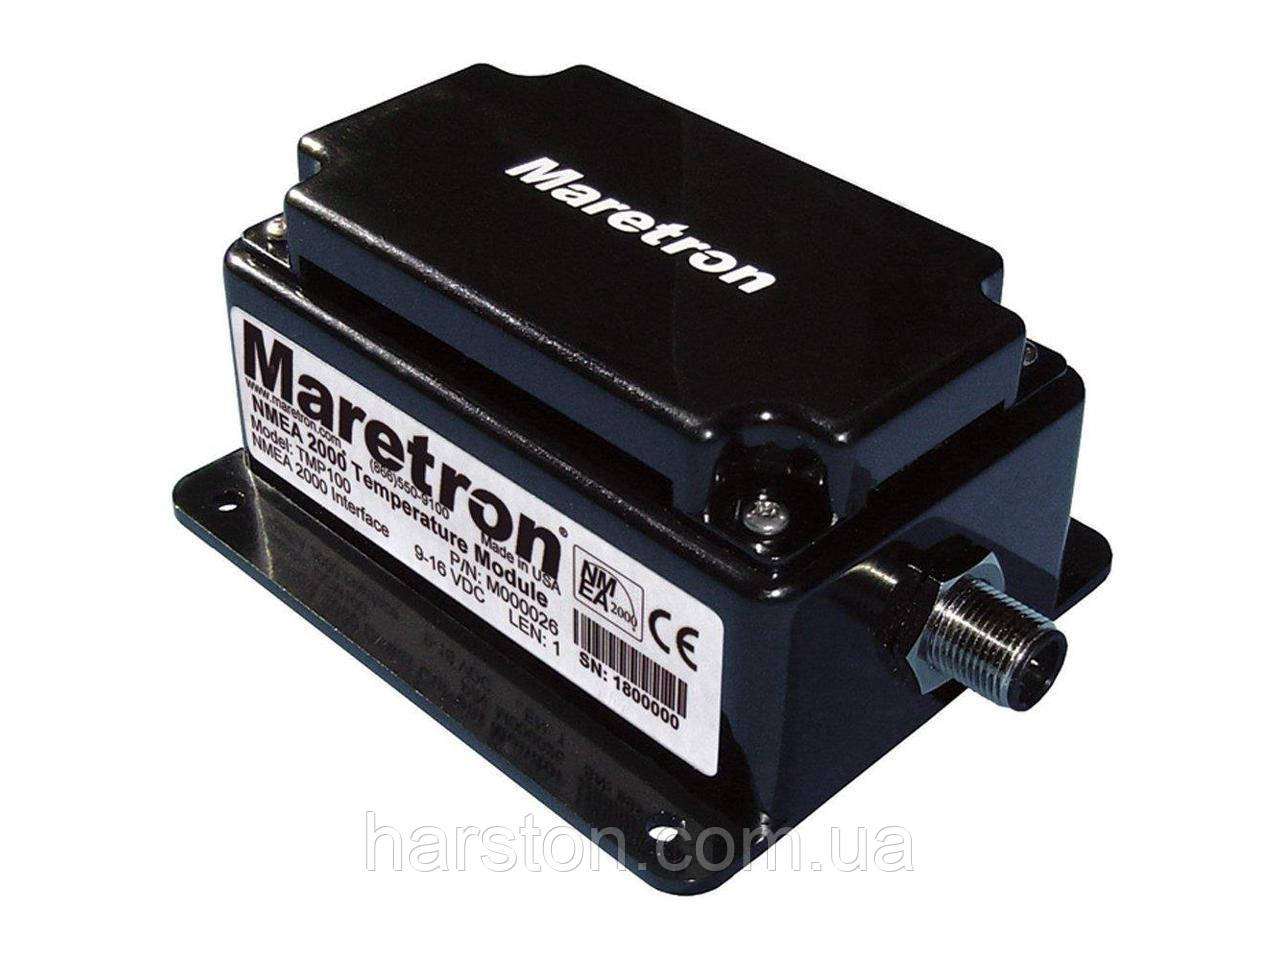 Maretron TMP100 Модуль индикации температуры